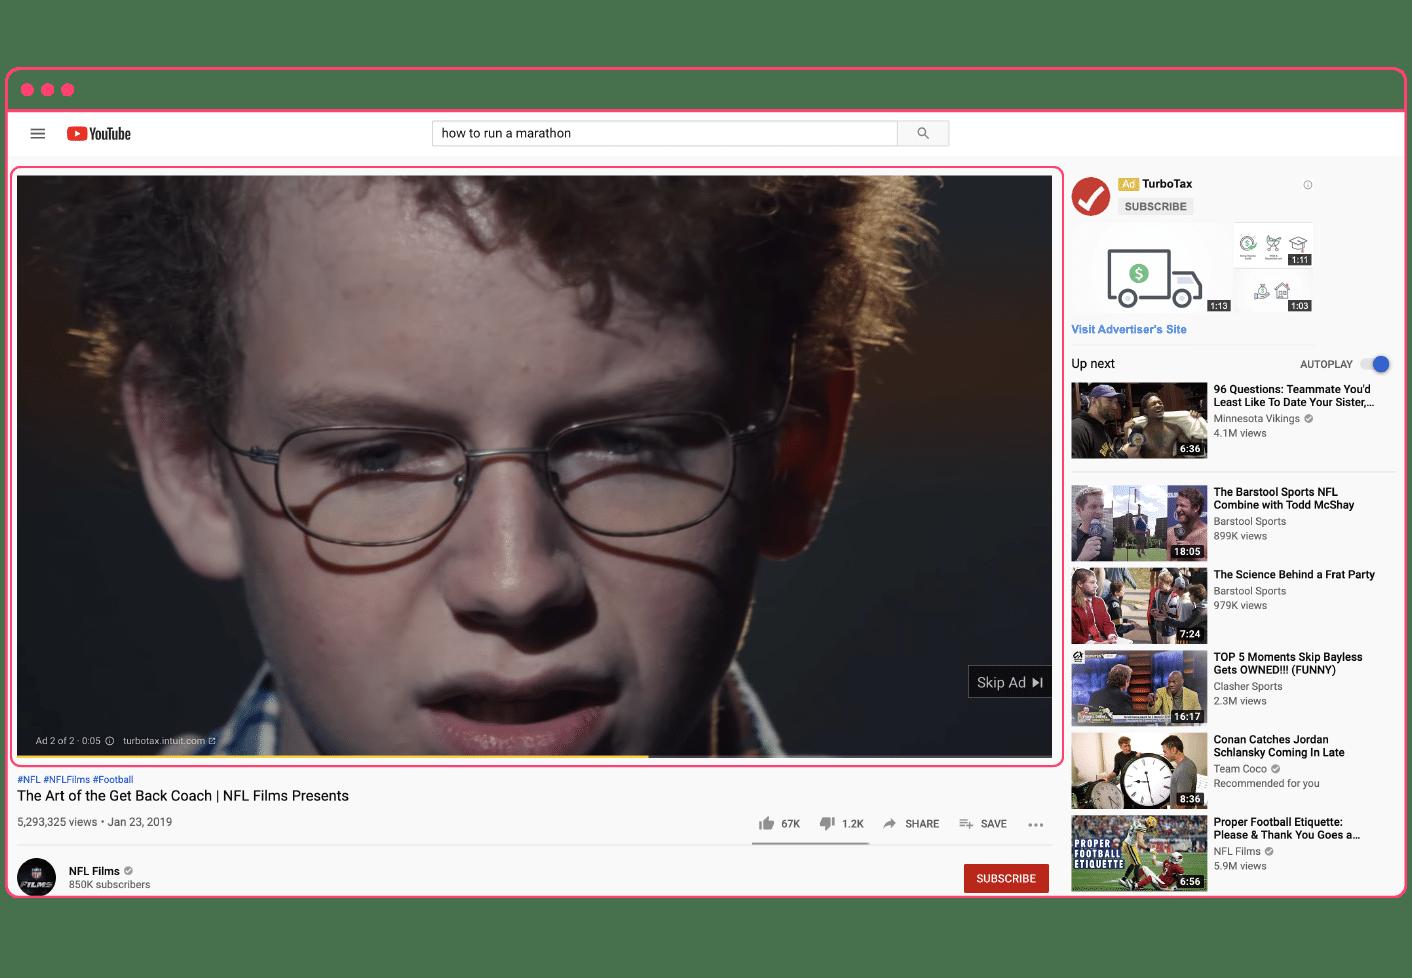 YouTube TrueView in-stream ad